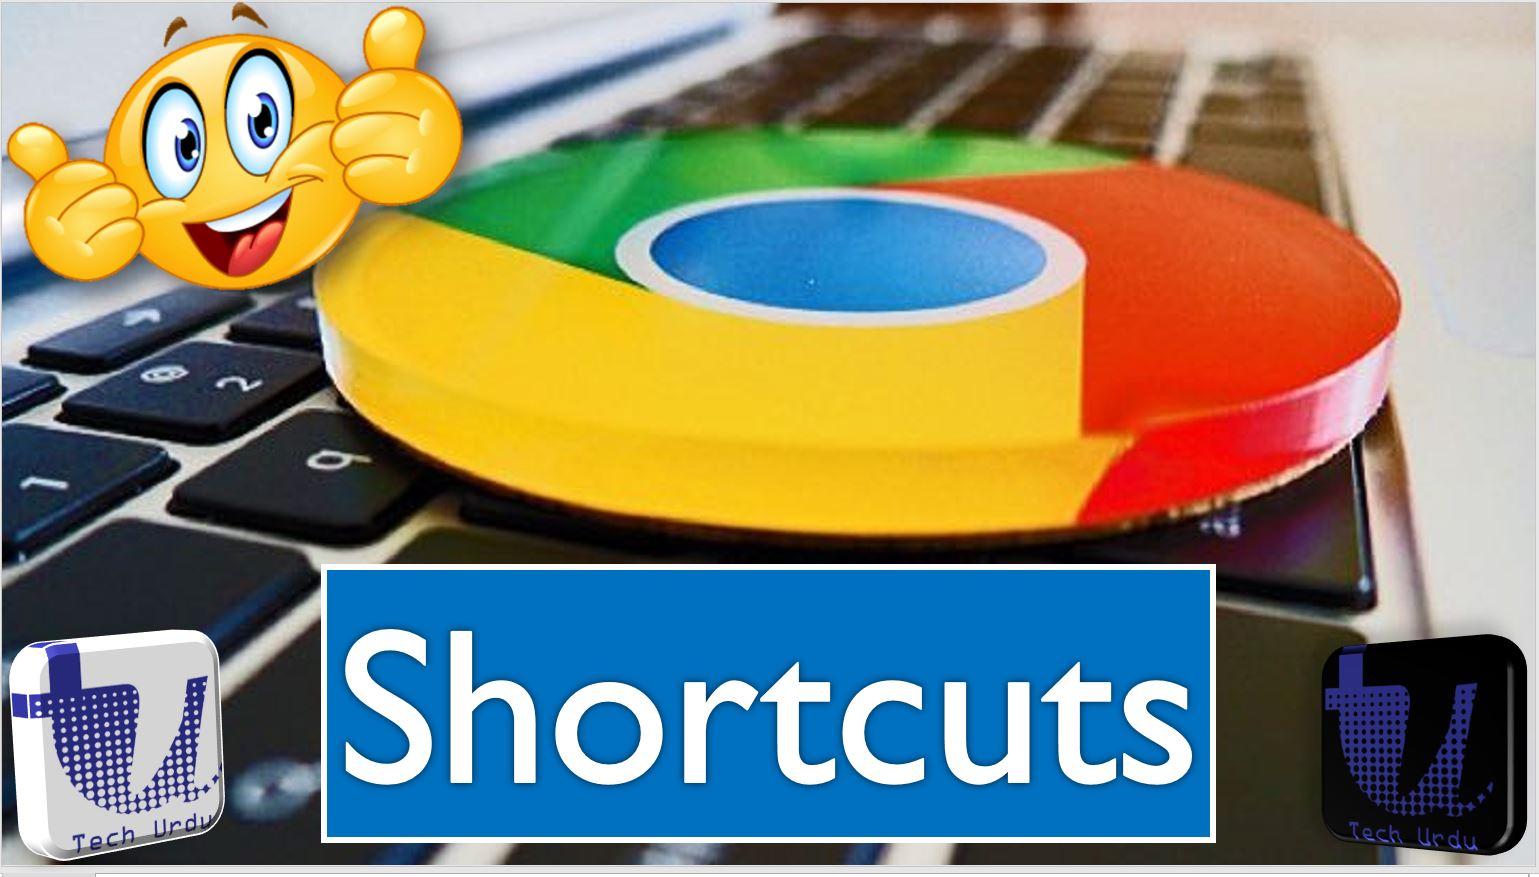 Google Chrome Shortcuts - Tech Urdu